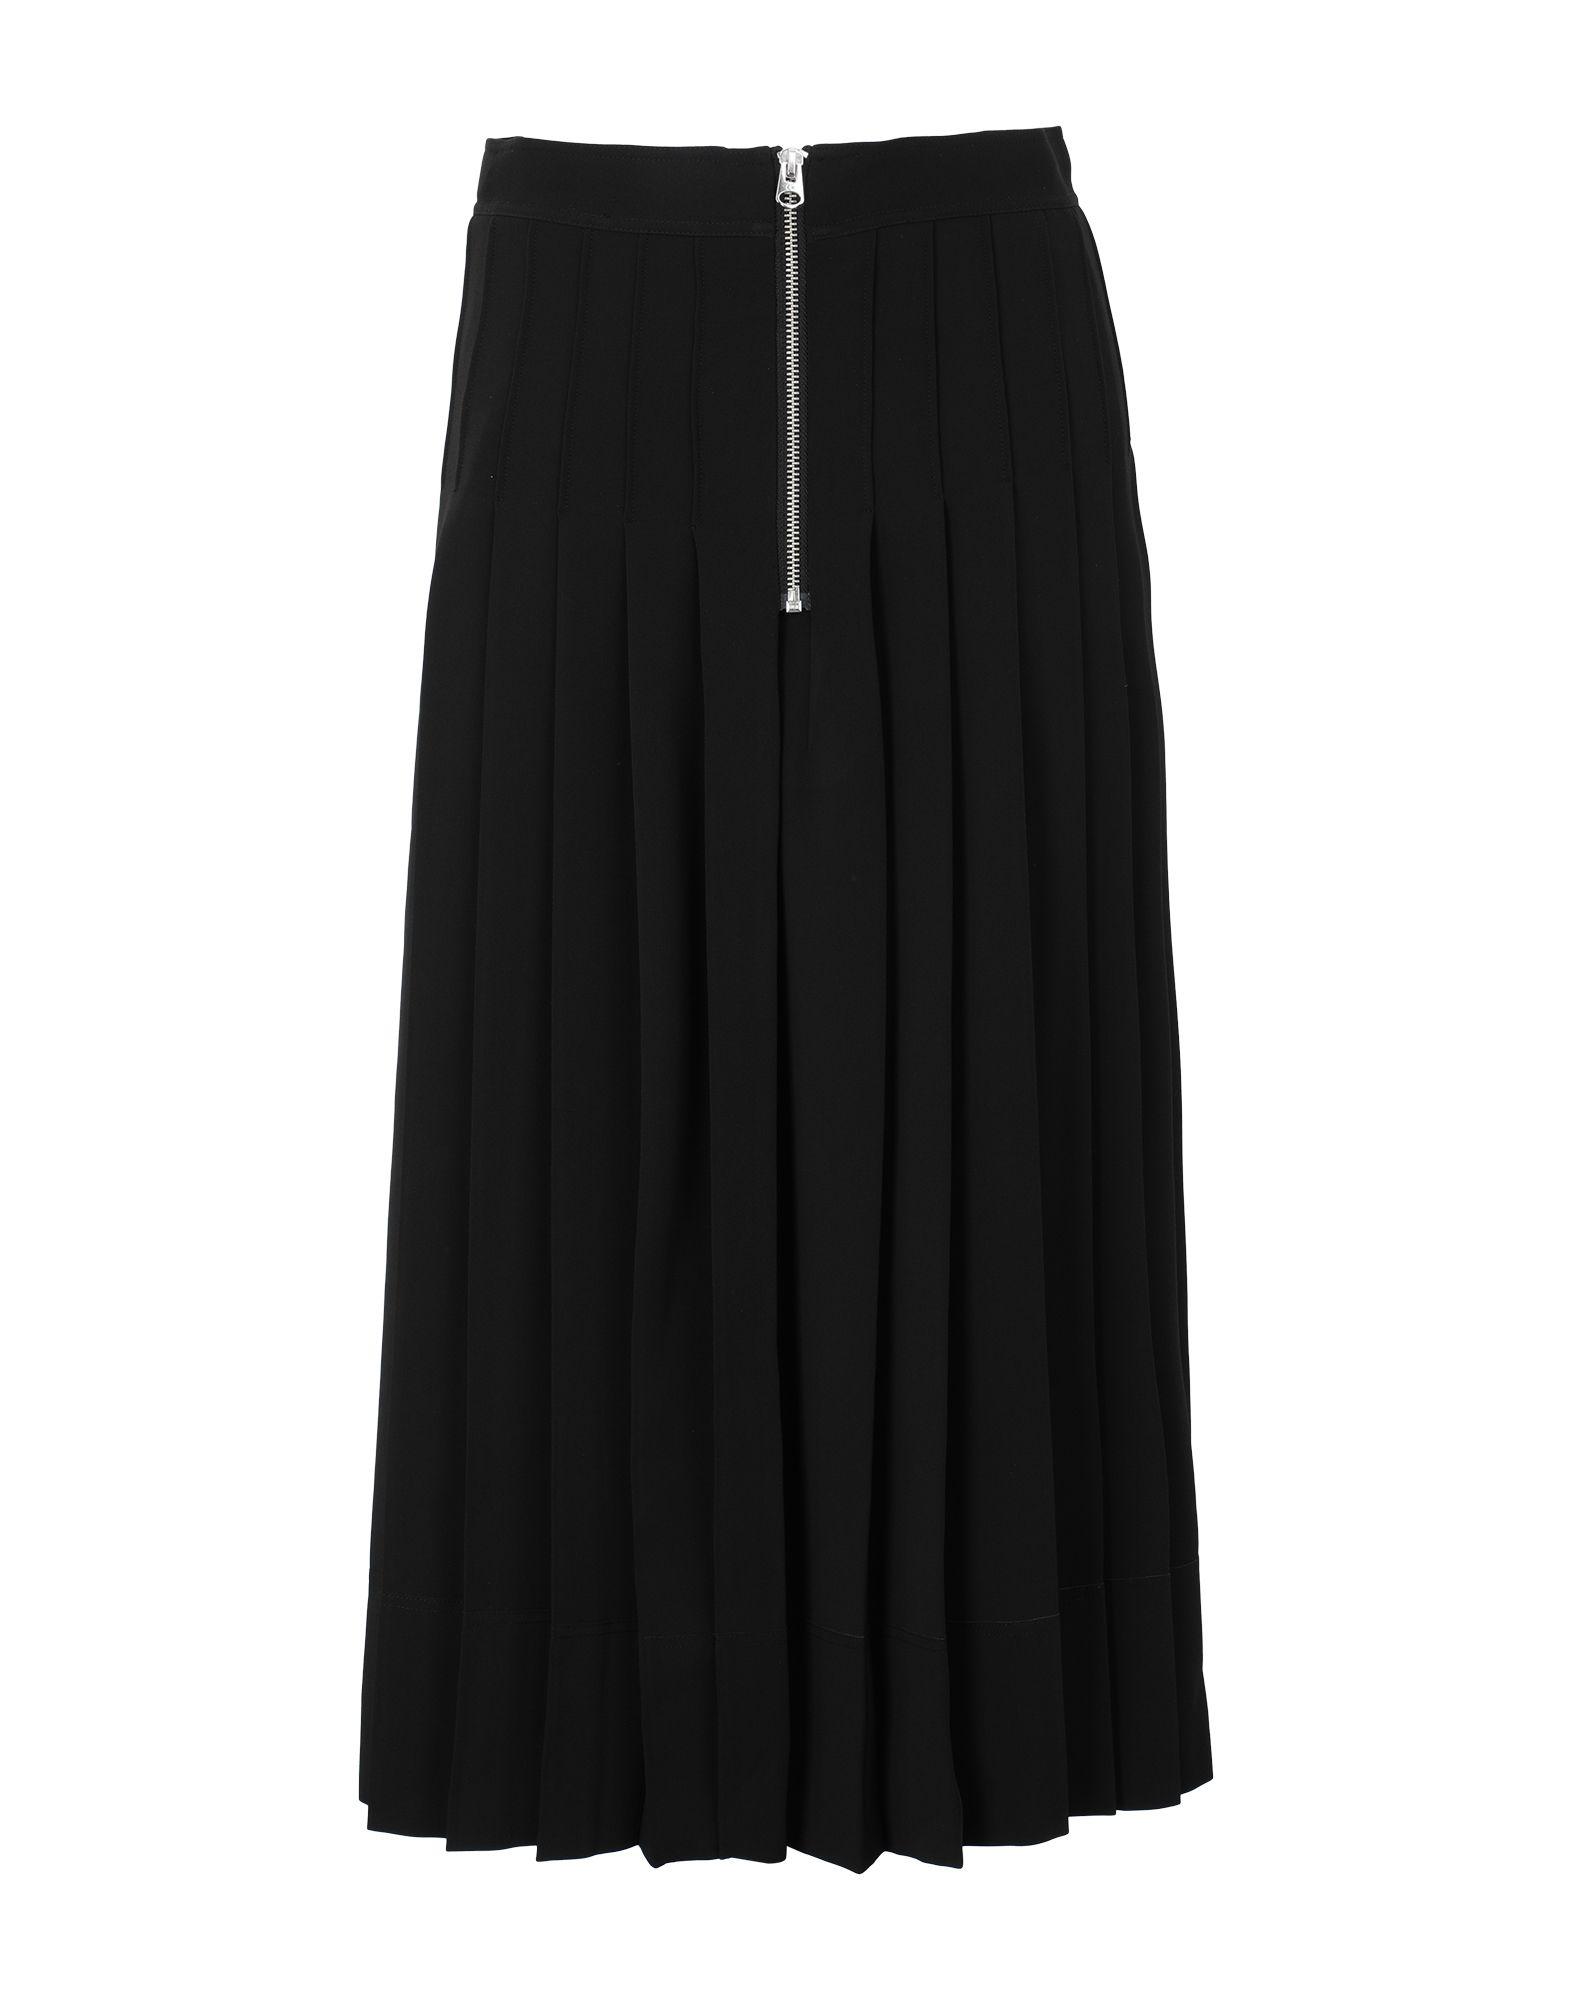 Фото - CALVIN KLEIN Юбка длиной 3/4 calvin klein collection юбка длиной 3 4